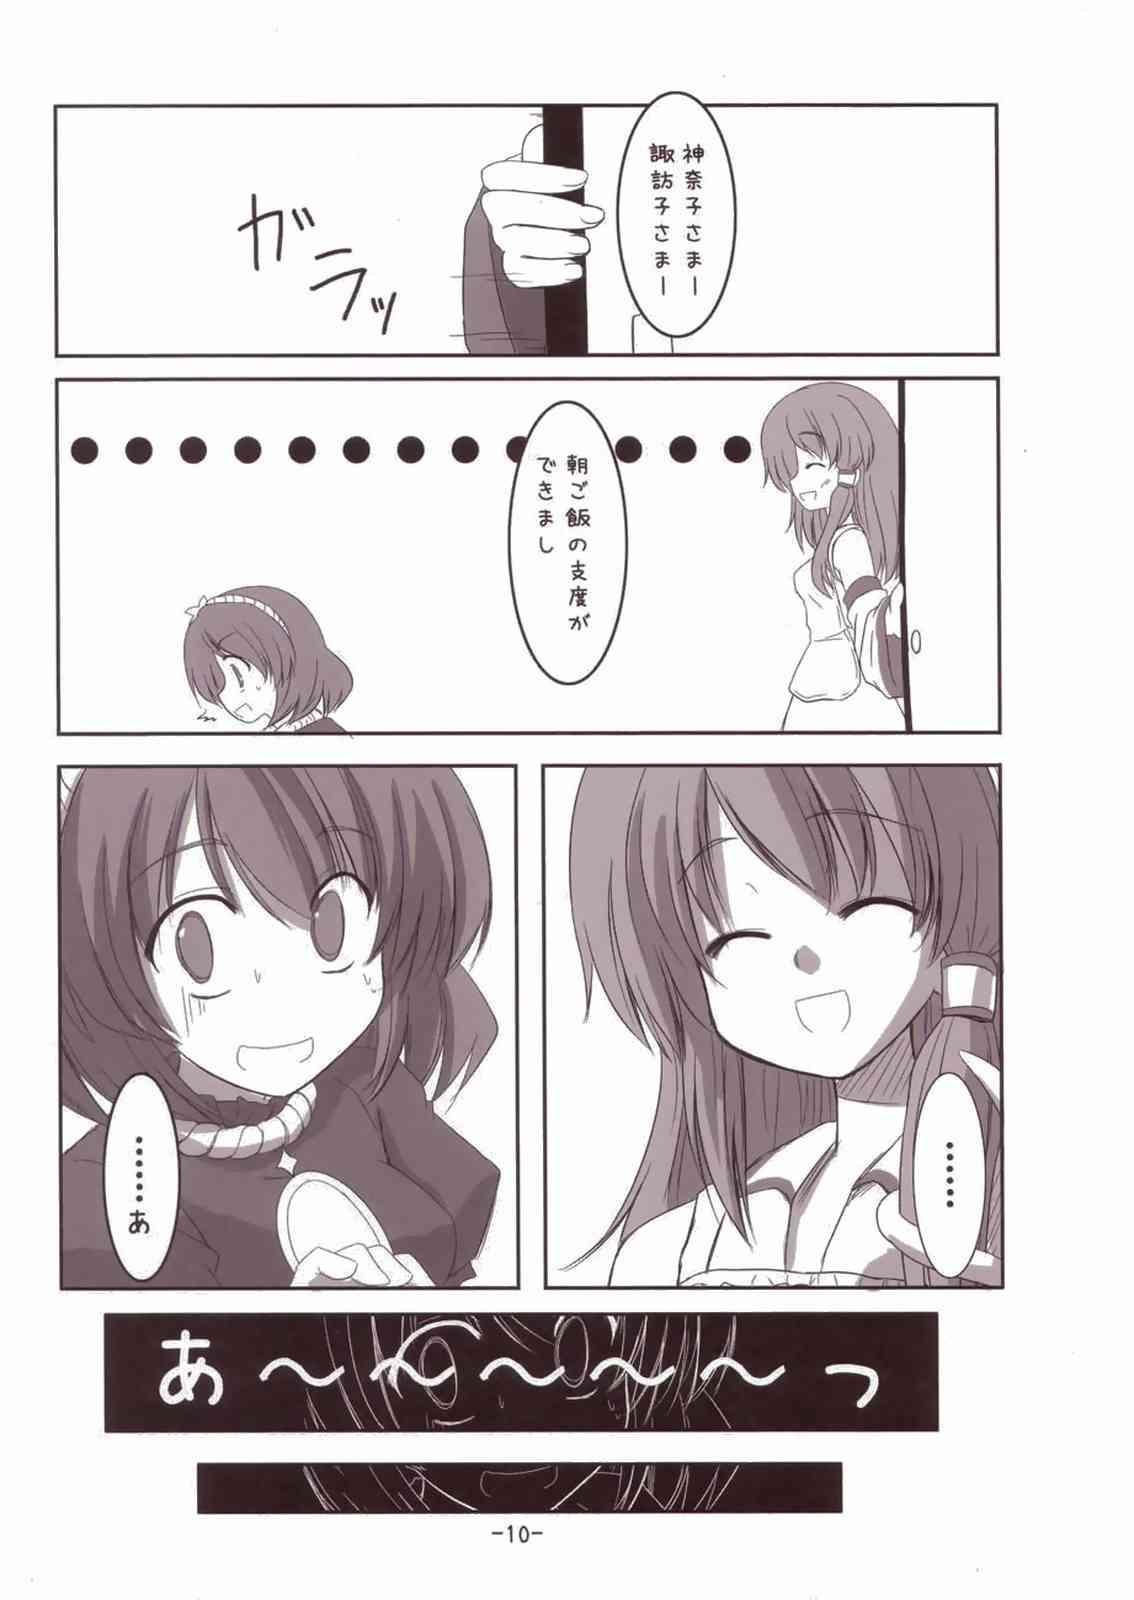 Suwako-sama to Issho! 9